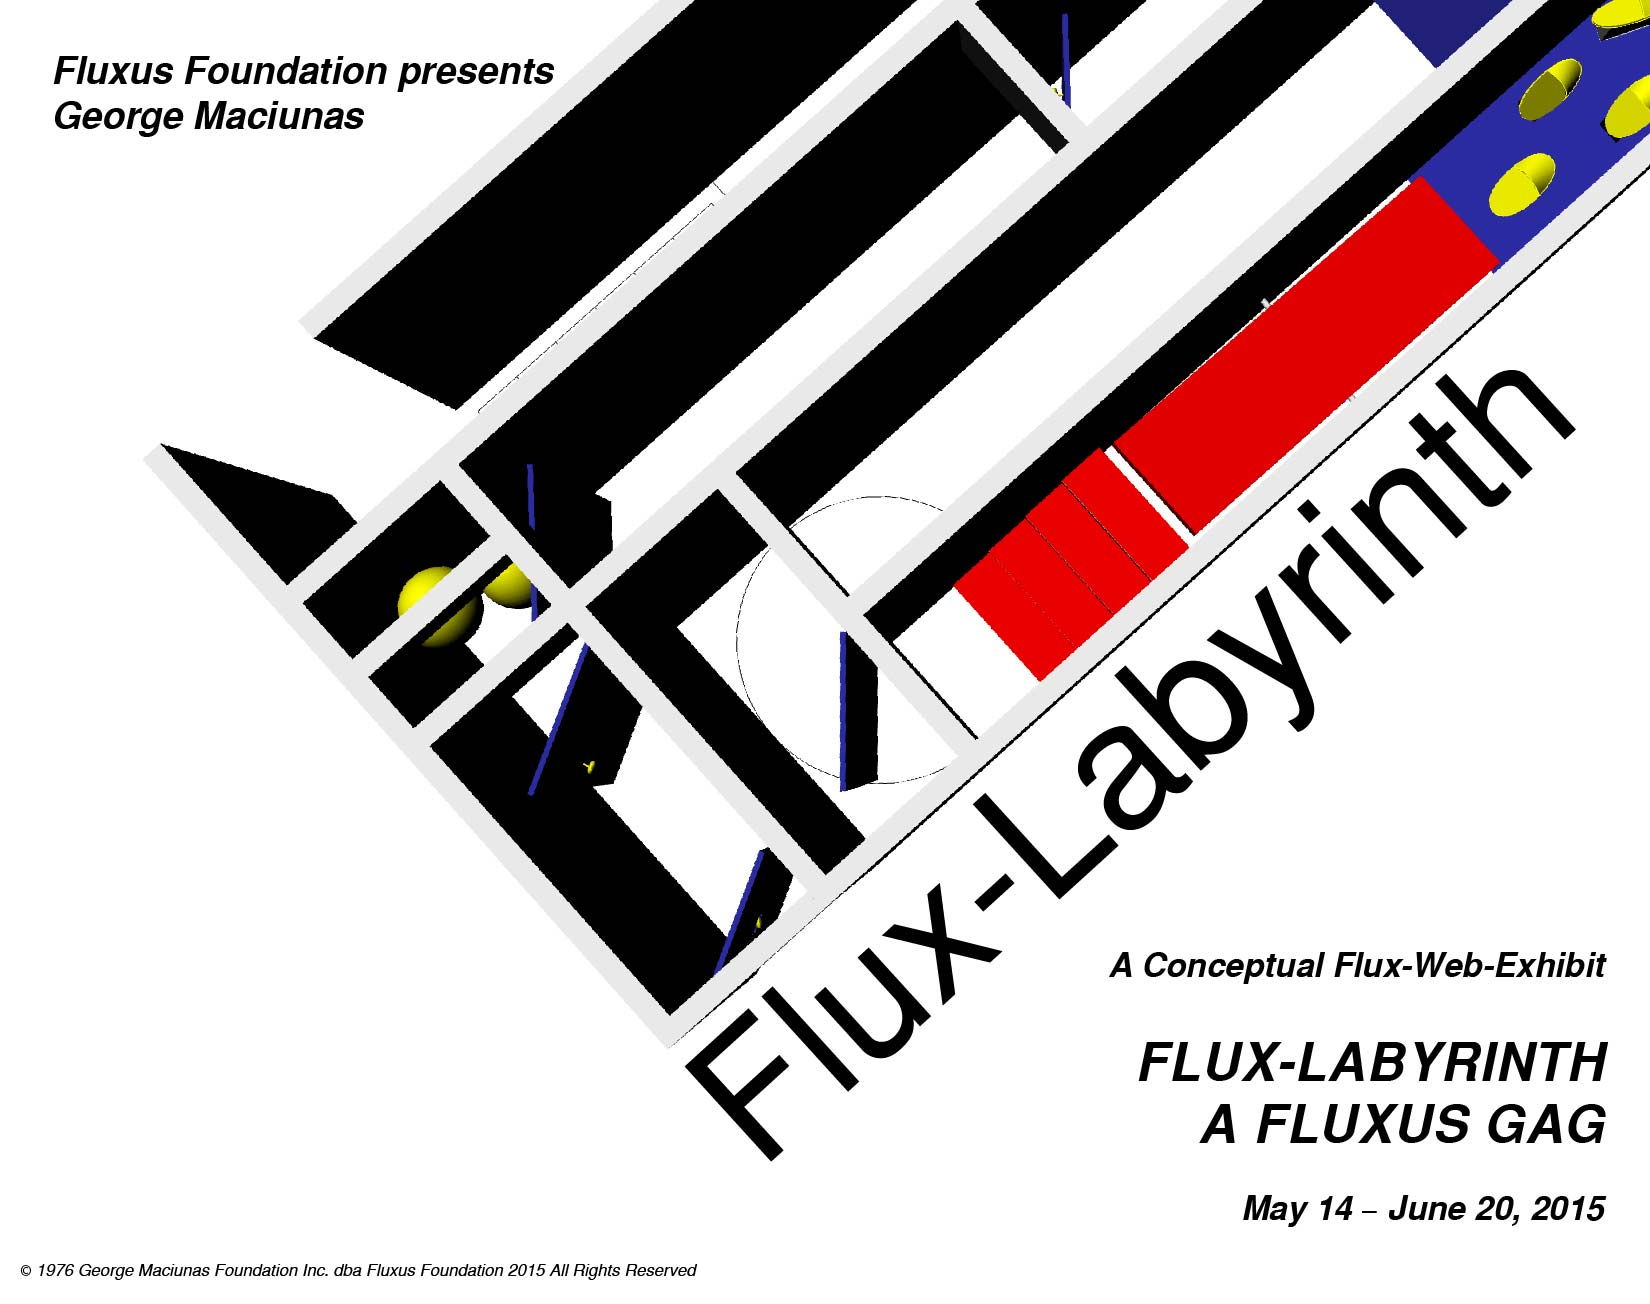 Poster_FluxLabyrinth_Fluxus Foundation